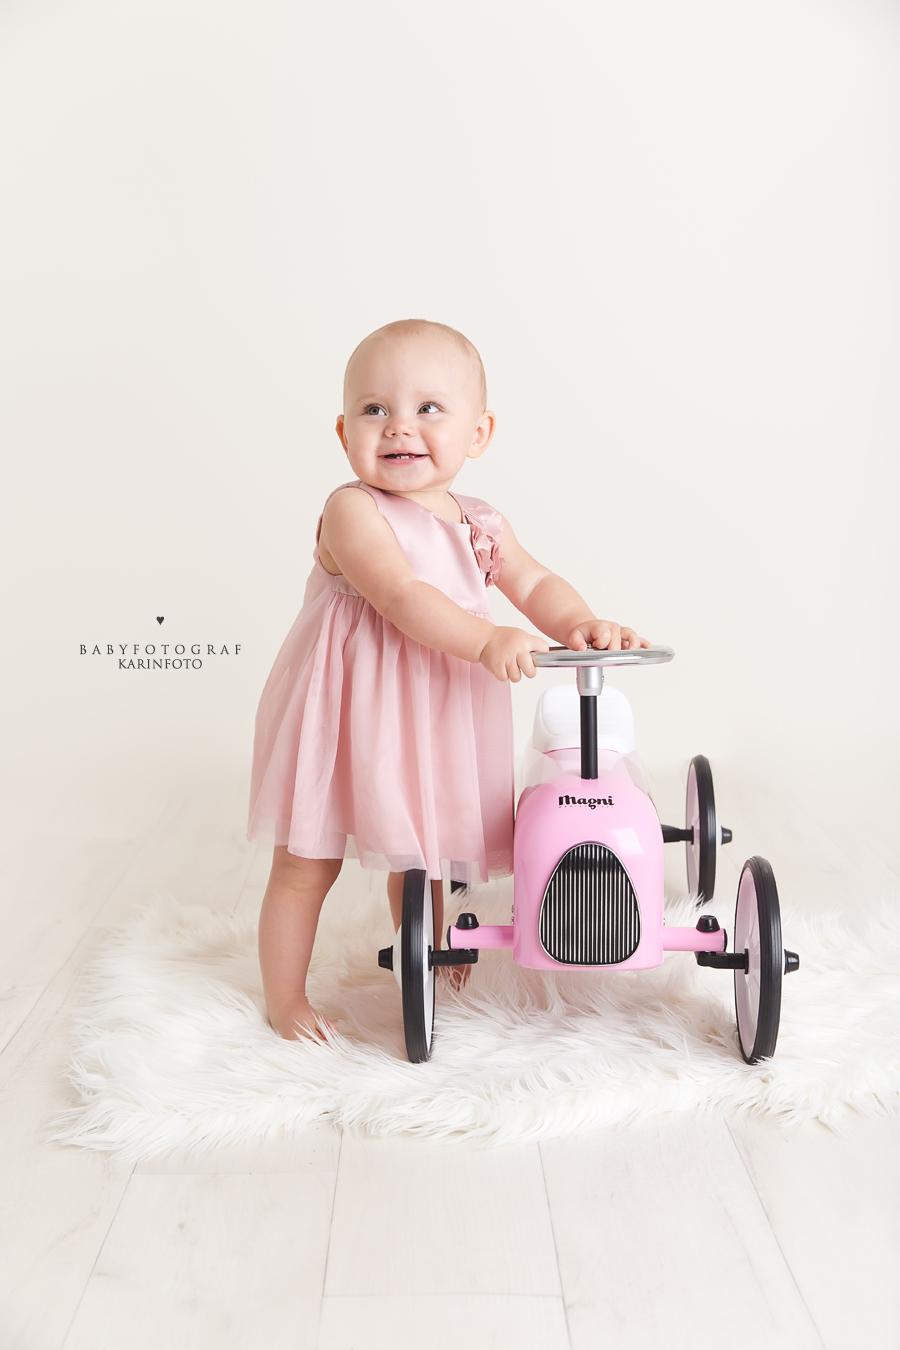 gåbil,Ettårsfotografering,babyfotograf,karinfoto,karin Pedersen,ettår,fotograf,photoshoot